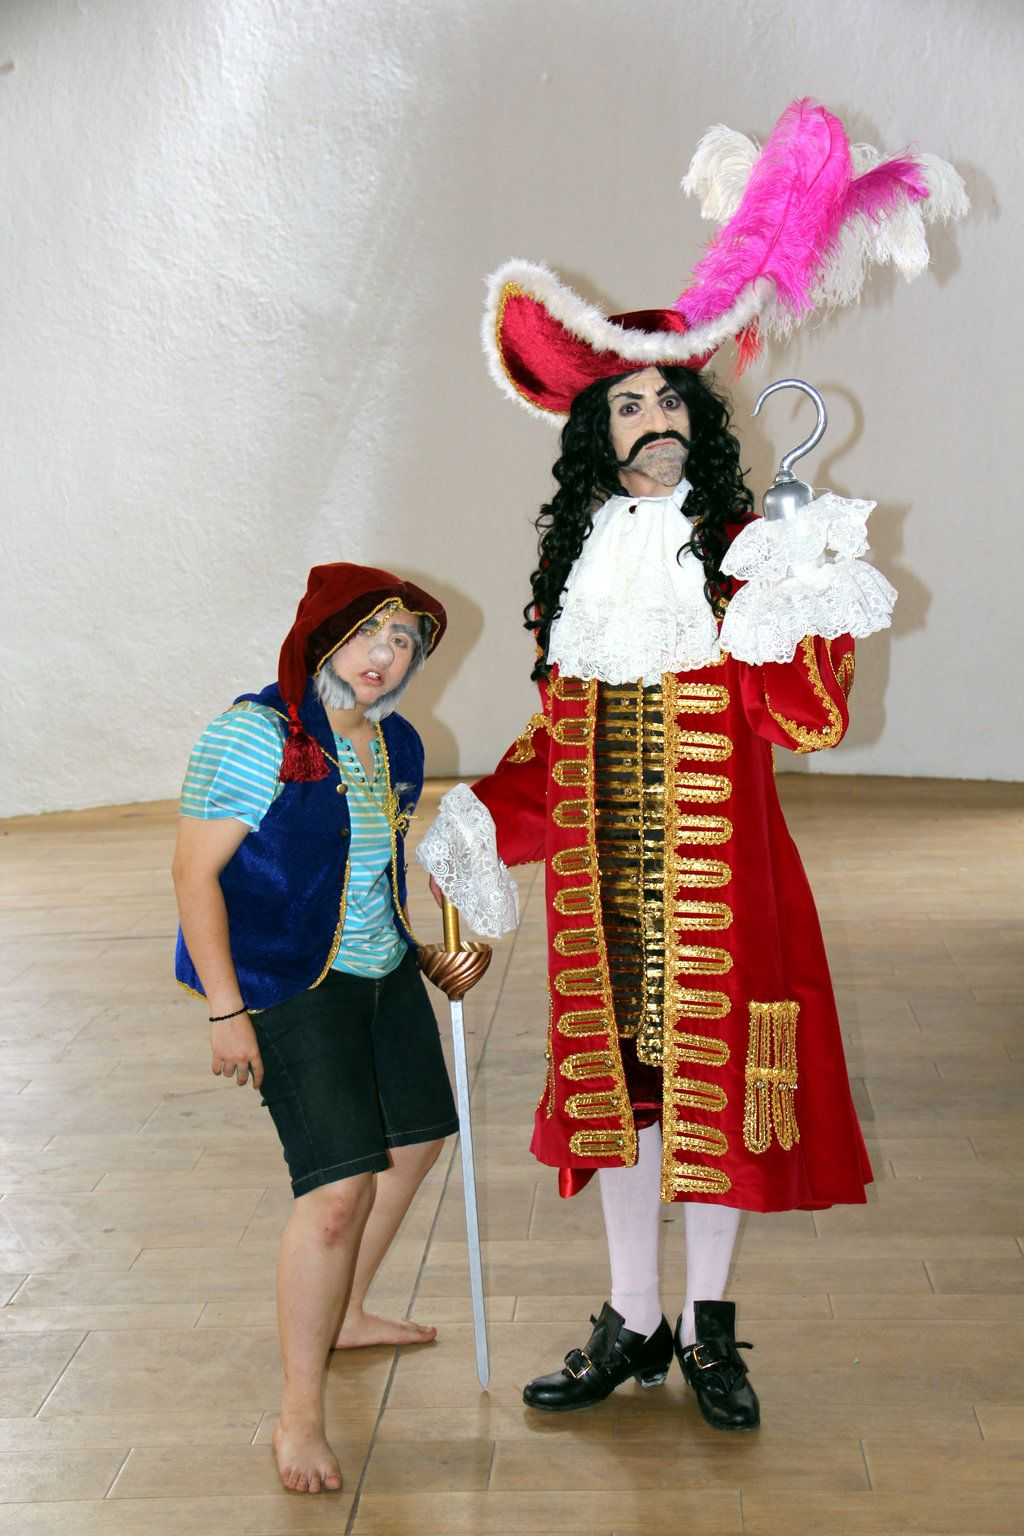 Captain Hook Costume And Makeup Jooskellington